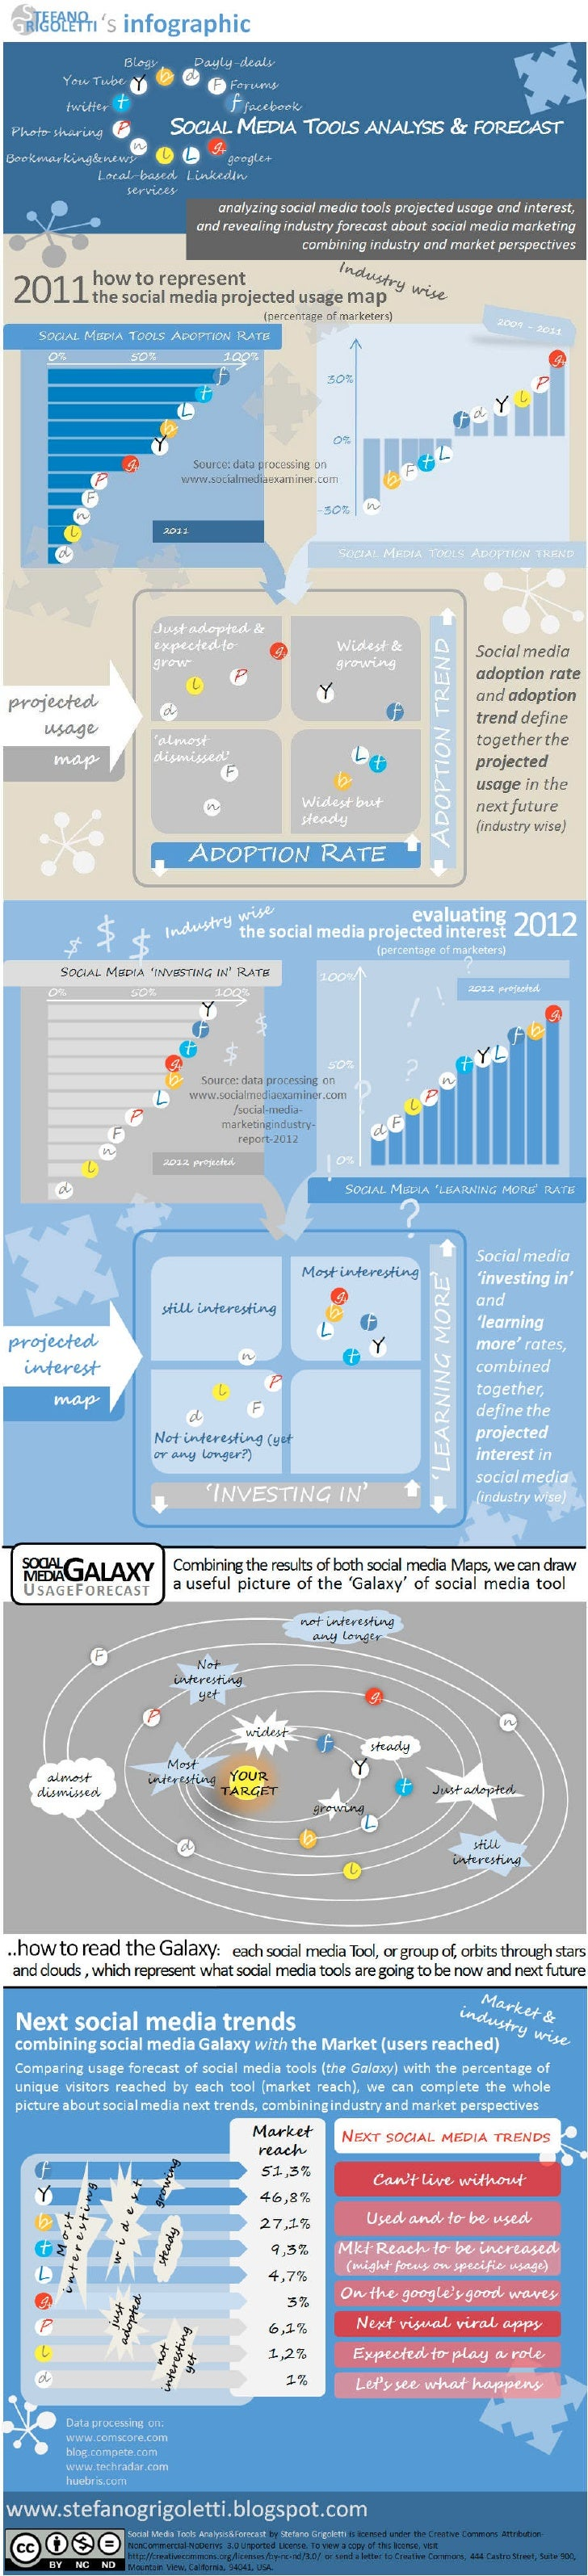 Social Media Industry & Market Forecast - Infographic